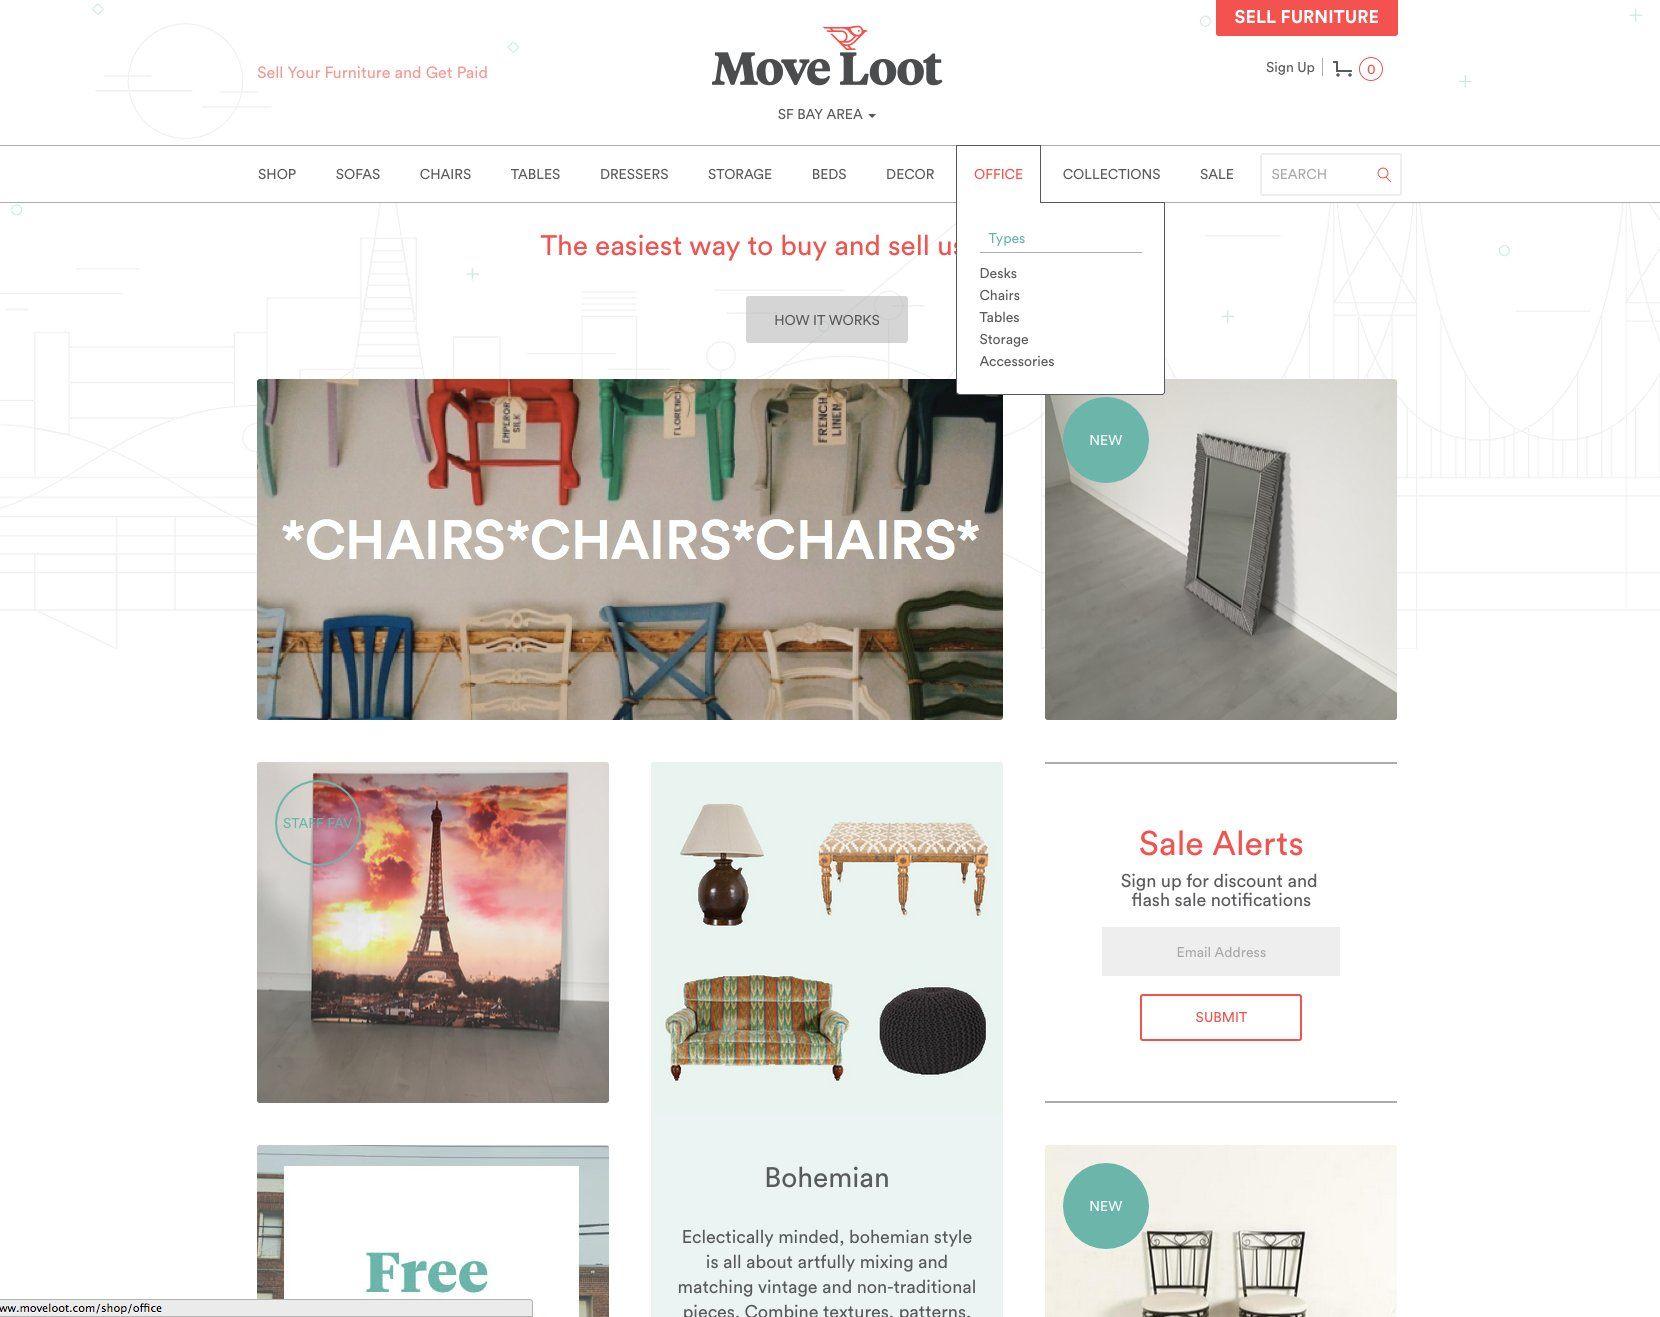 Move Loot Buy furniture online, Selling furniture